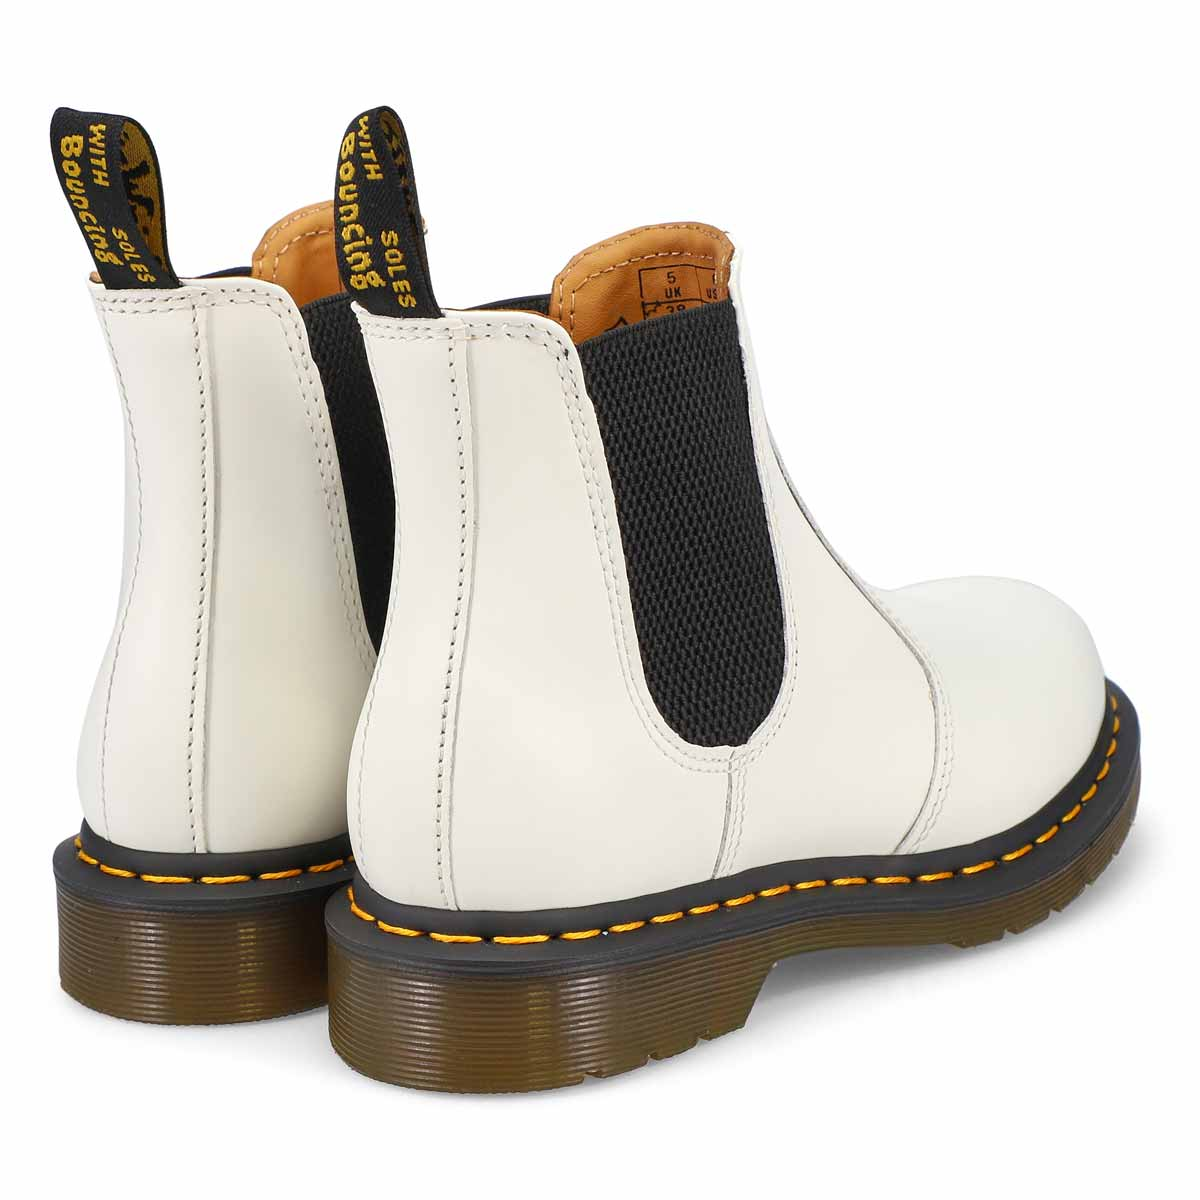 Women's 2976 Yellow Stitch Chelsea Boot - White